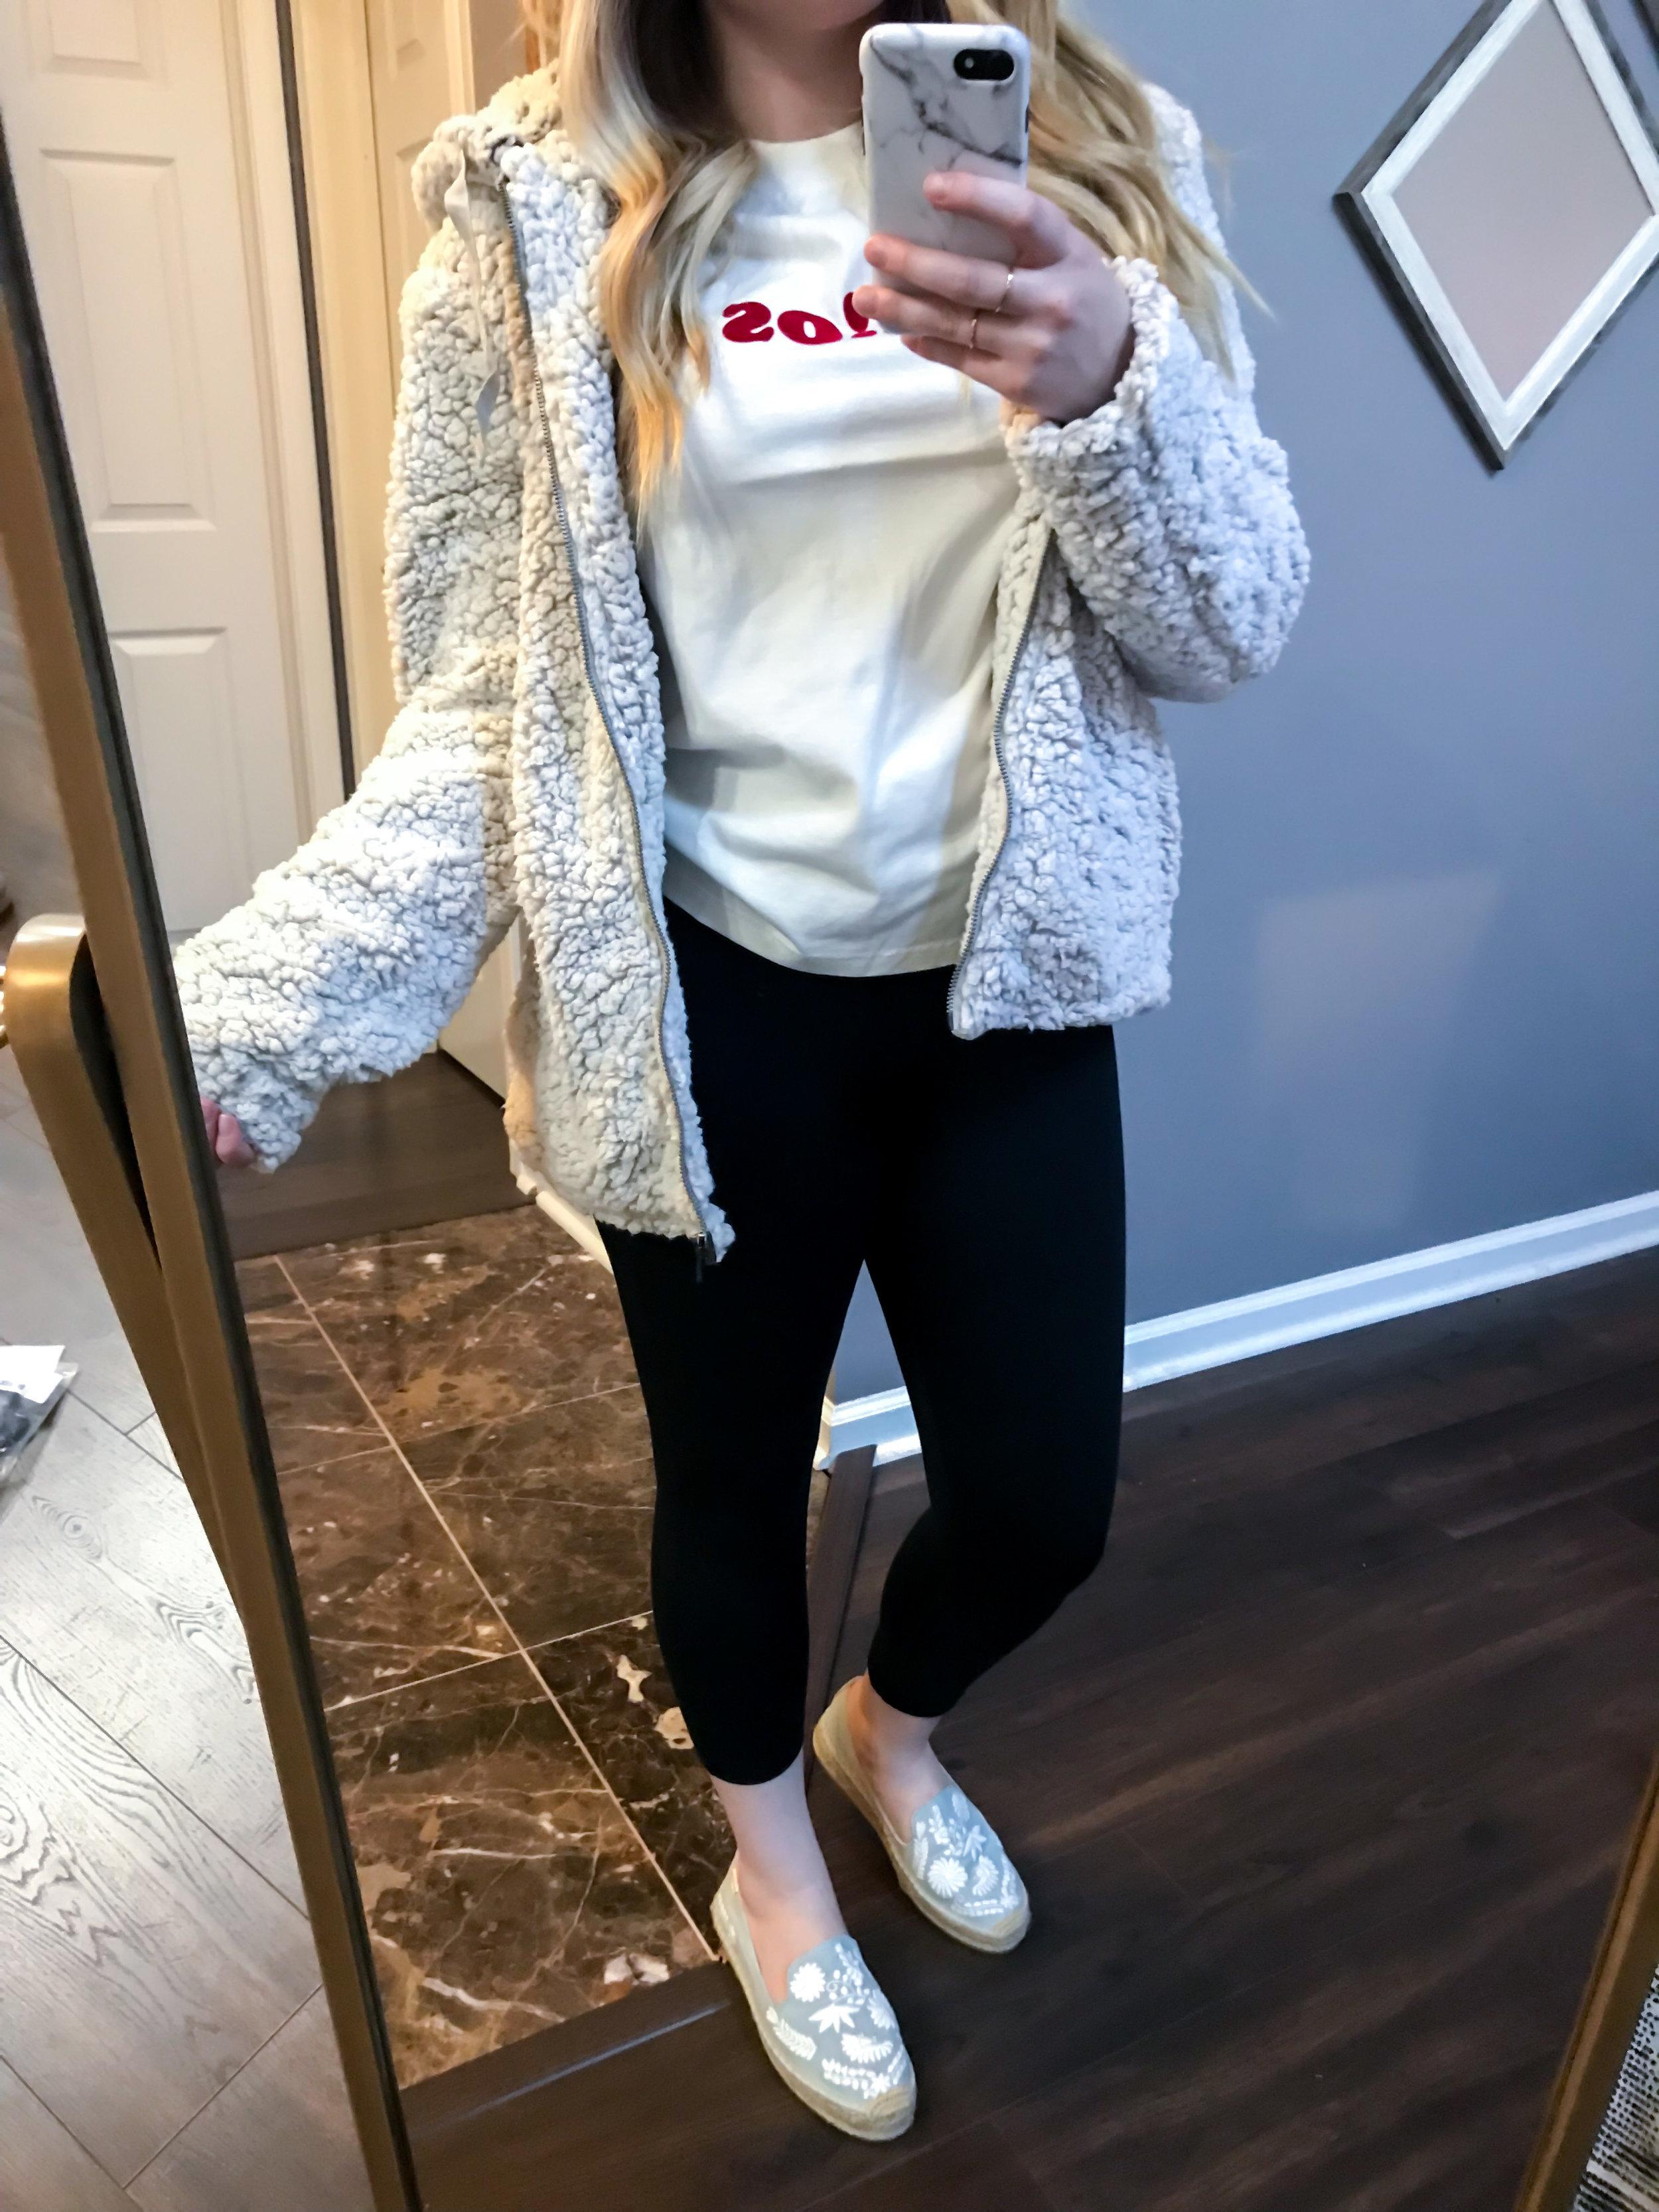 Maggie a la Mode Nordstrom Anniversary Sale 2018 Thread & Supply Brandon Fleece Jacket, Madewell Adios Tee, Zella Live-In Lite Crop Leggings, Soludos Ibiza Embroidered Loafer Espadrille